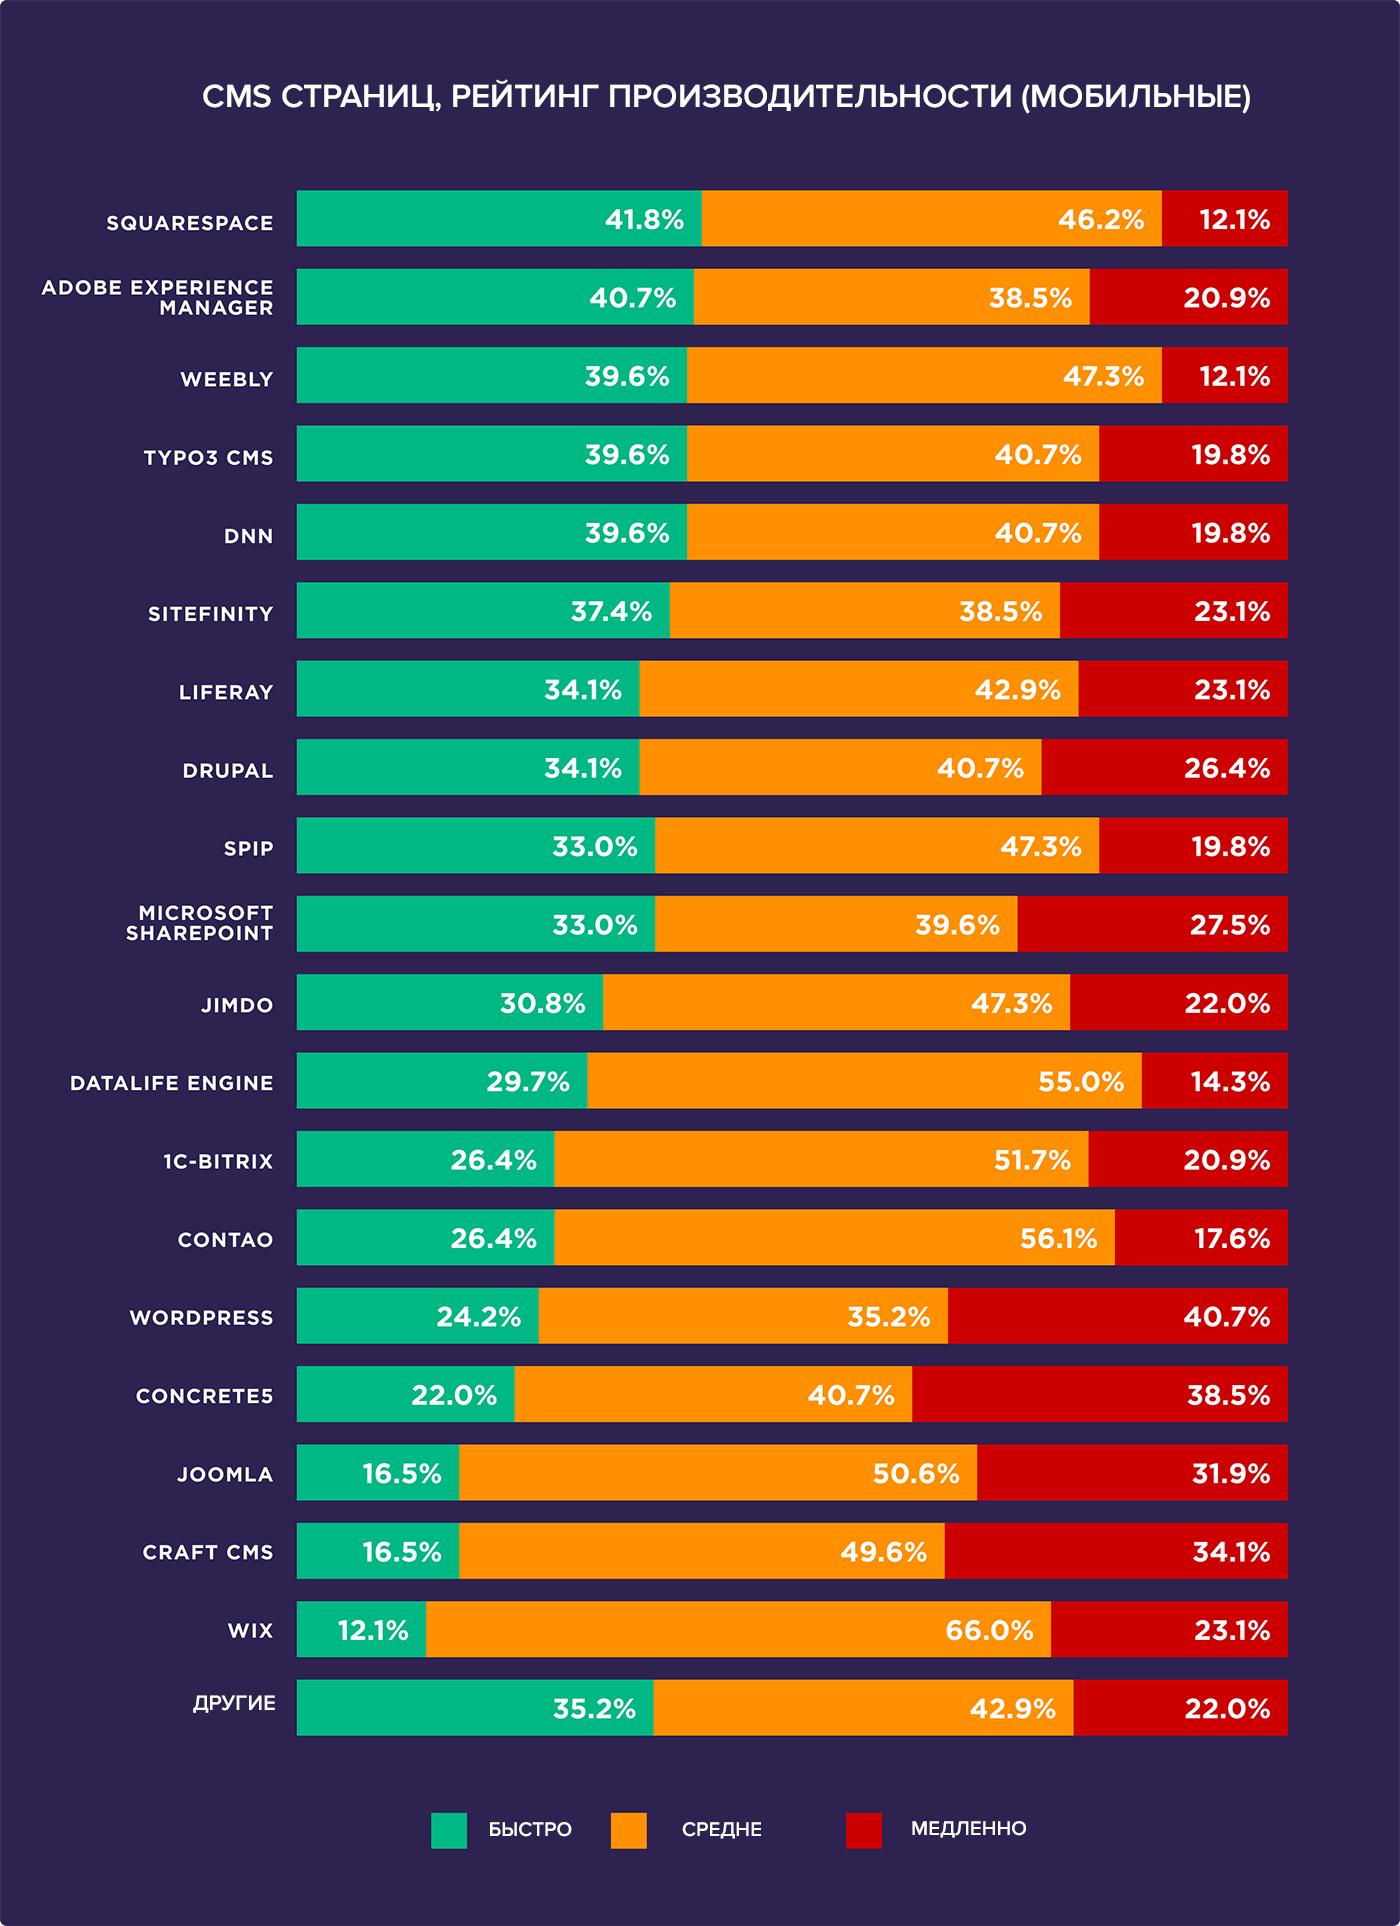 Статистика по CMS 2019